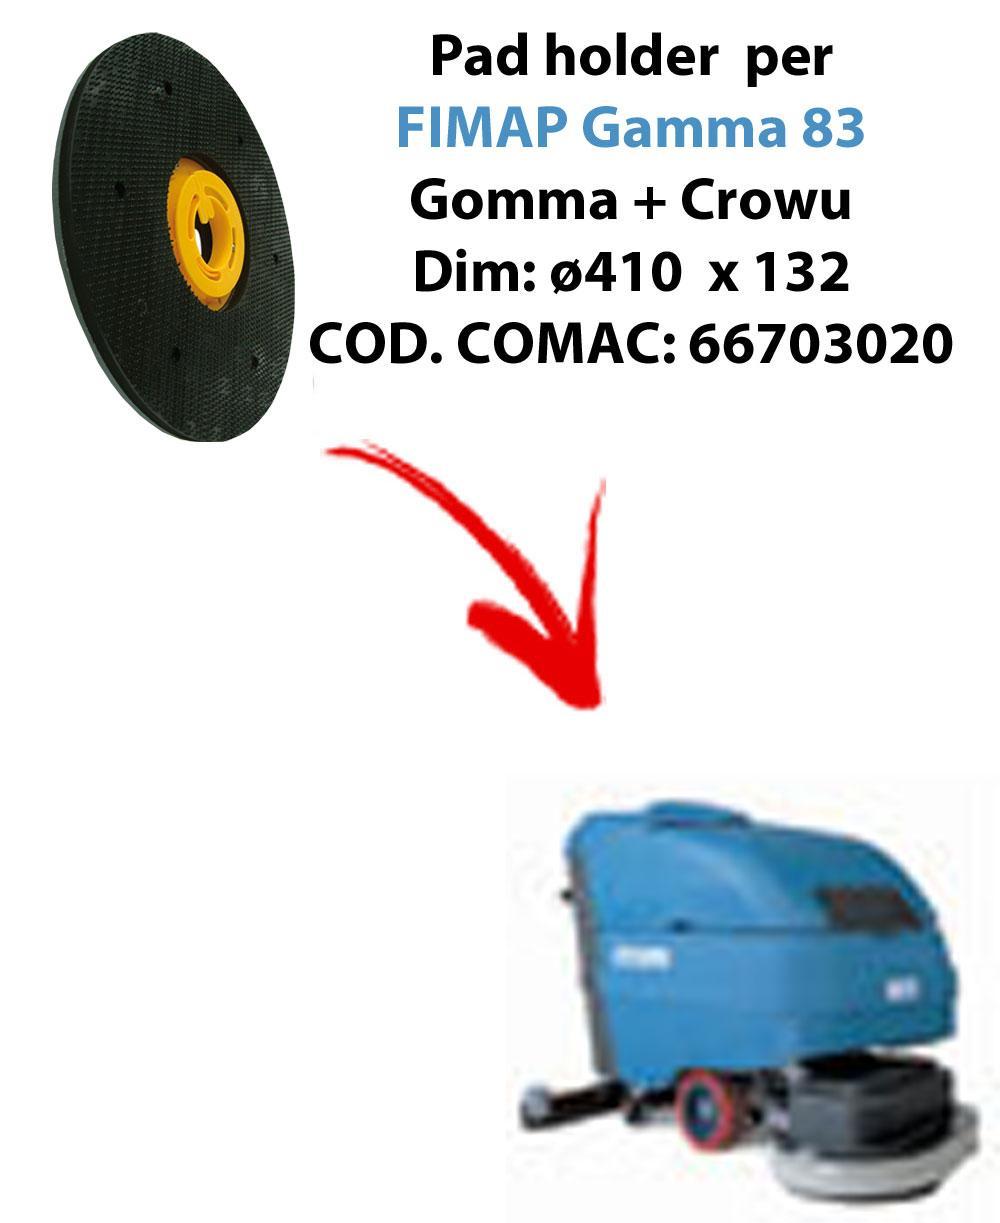 TRASCINATORE ( pad holder) per lavapavimenti FIMAP Gamma 83 (old version)